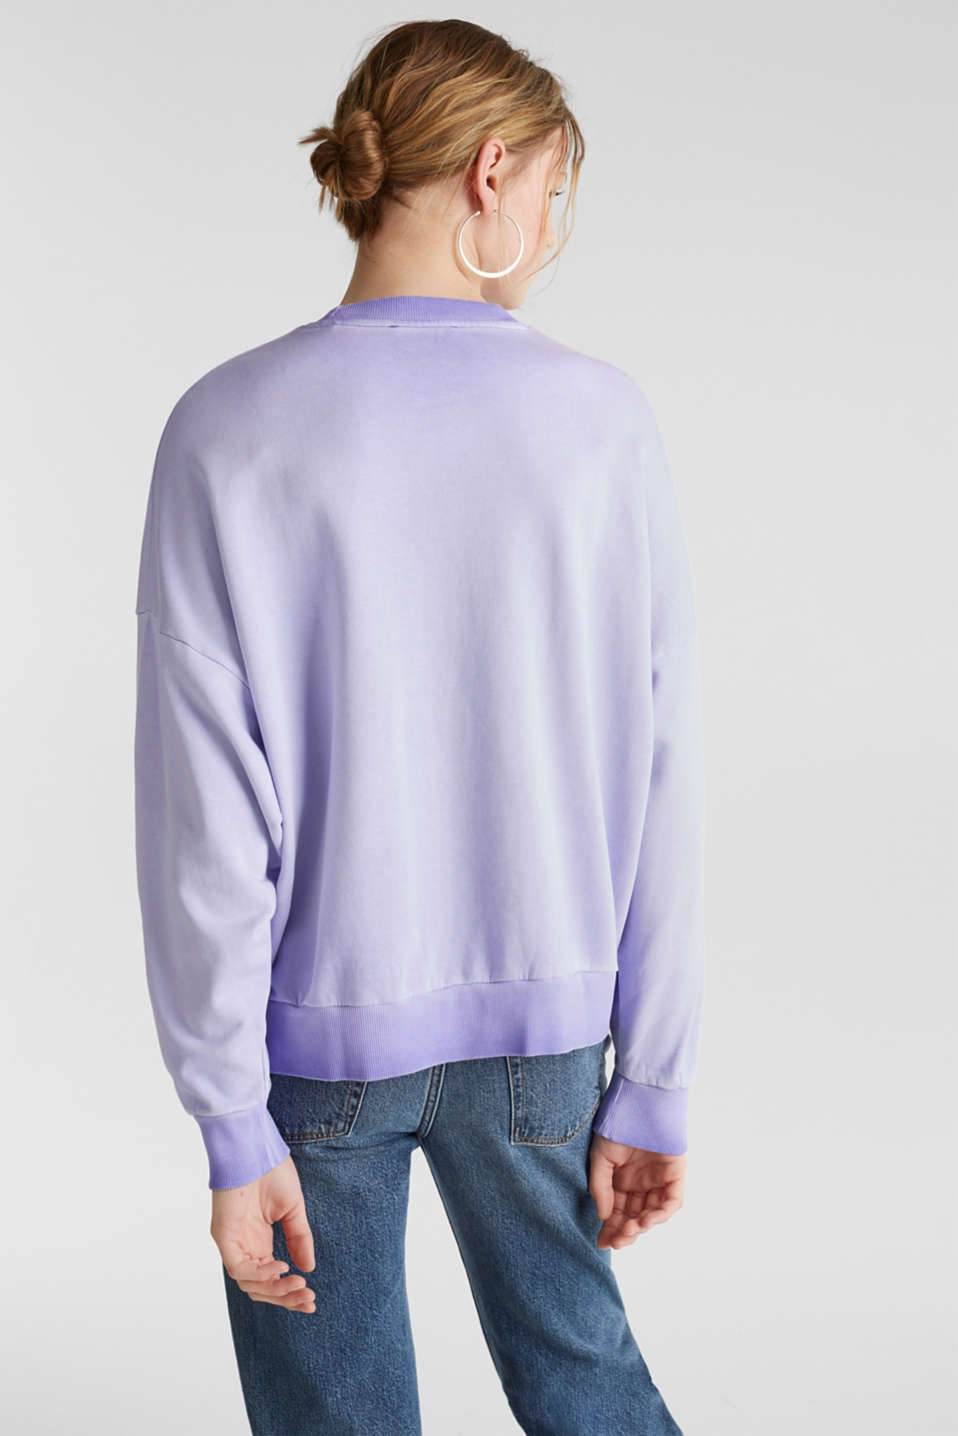 Sweatshirt with batwing sleeves, 100% cotton, DARK LAVENDER, detail image number 3